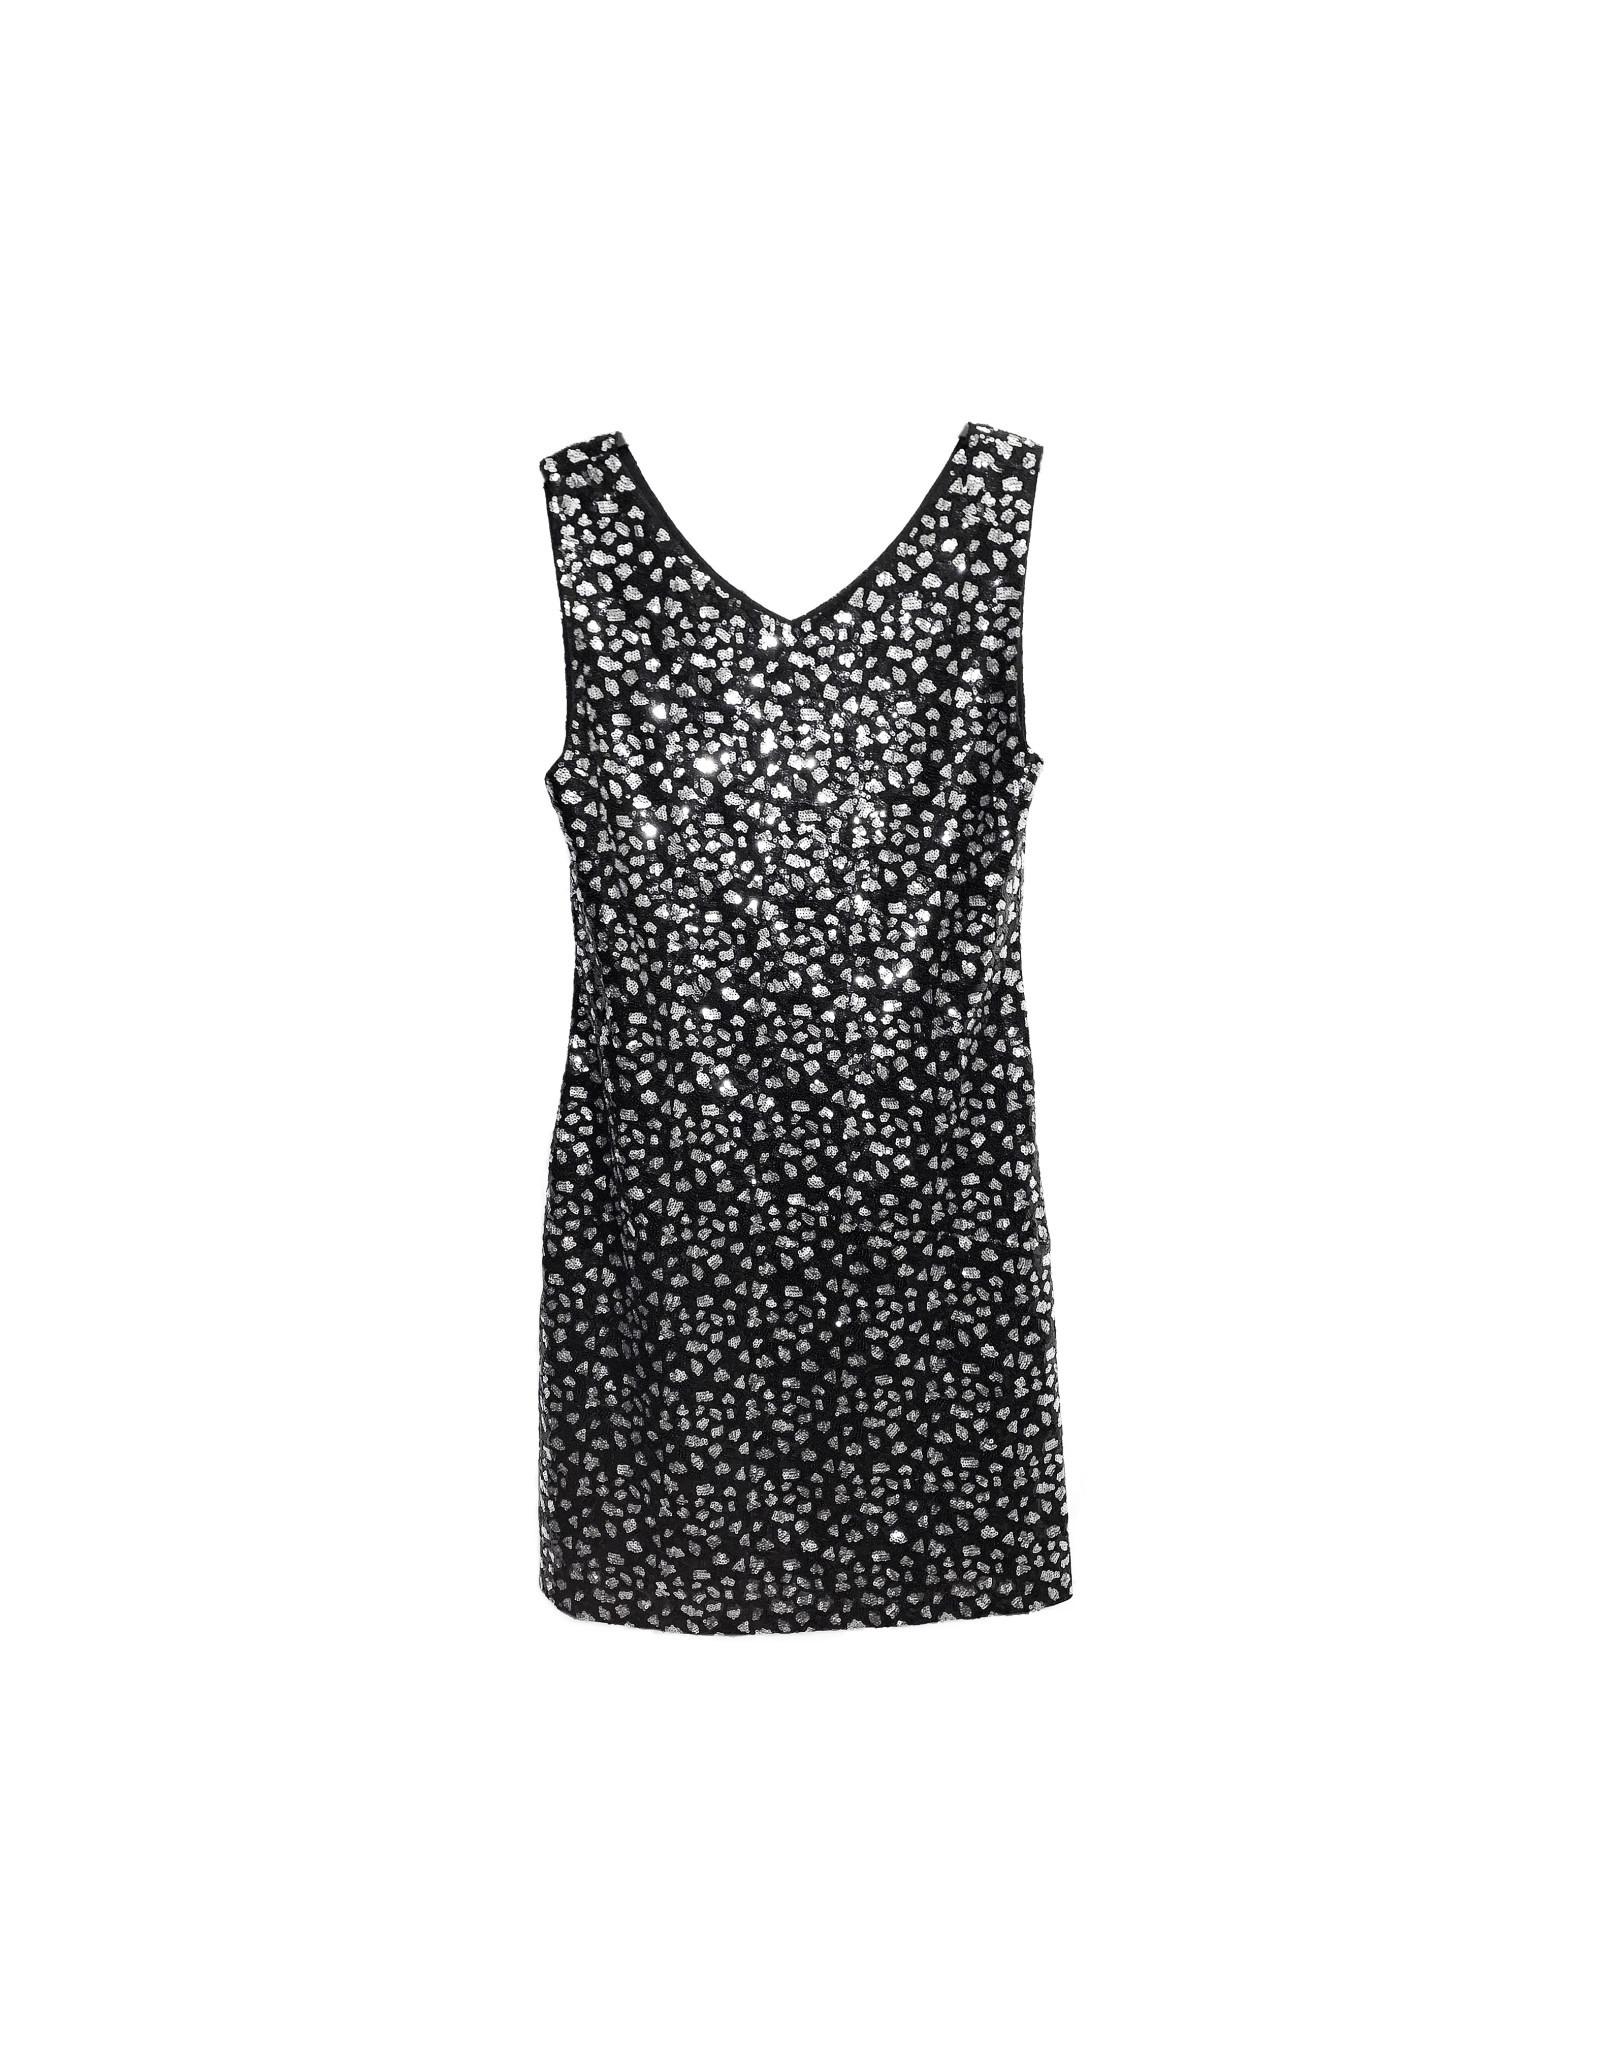 Maccike Maccike Sequin Dress